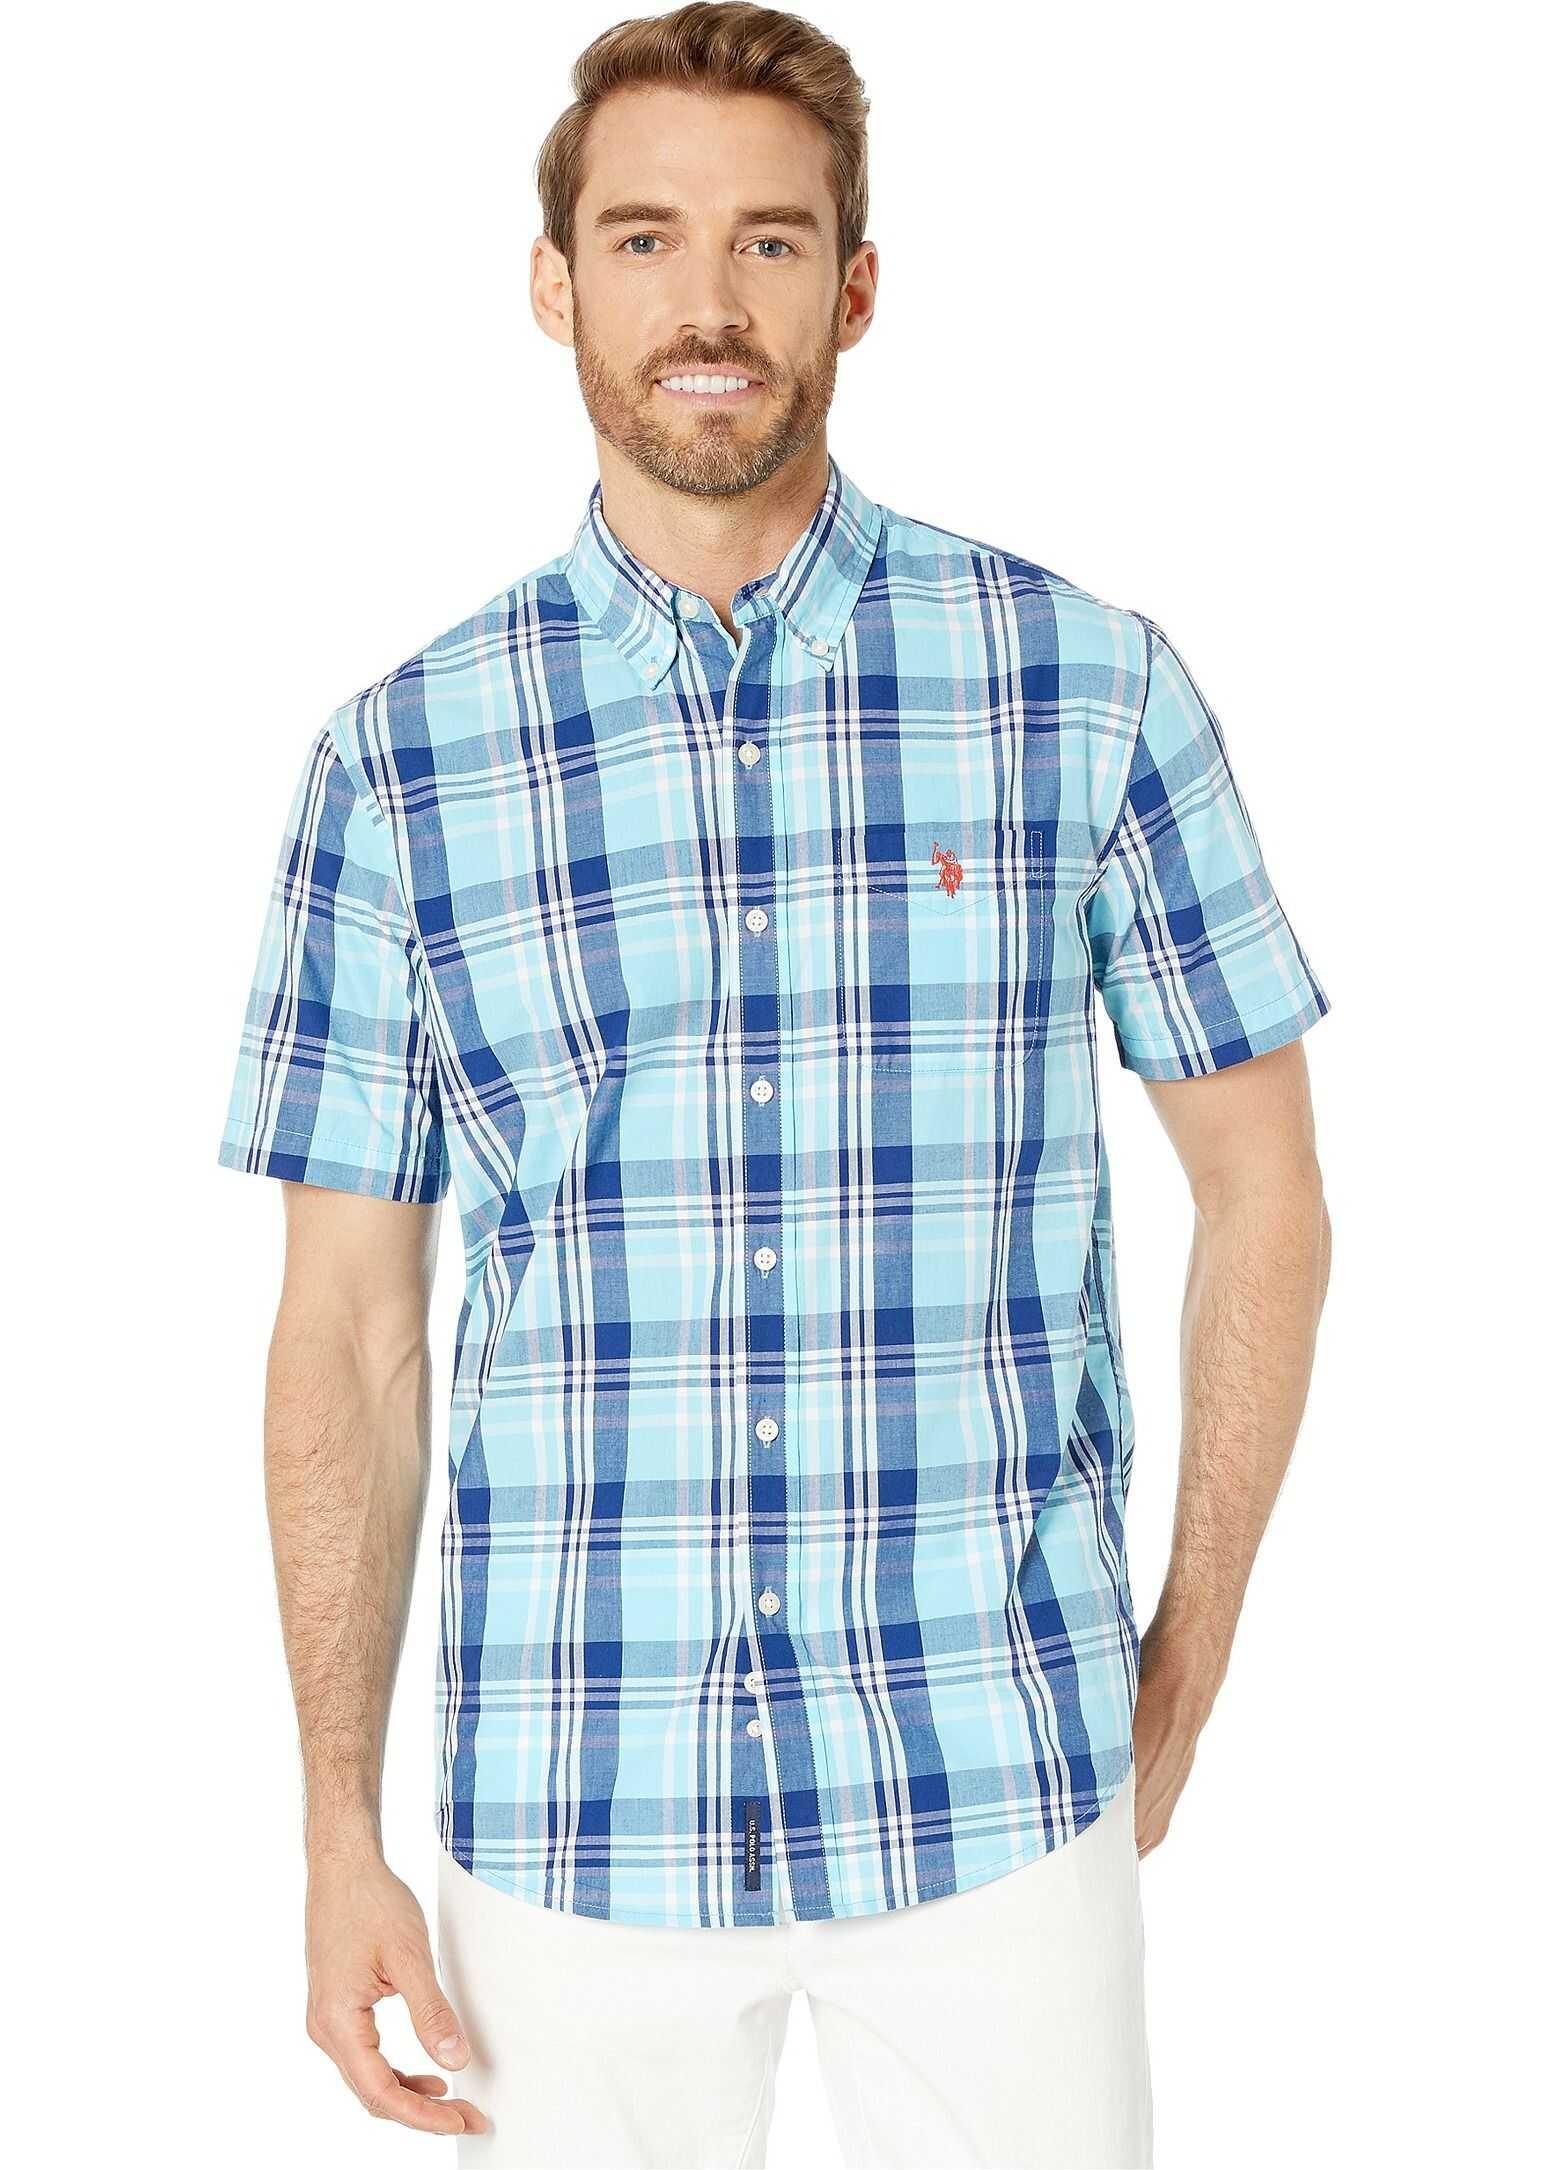 U.S. POLO ASSN. Short Sleeve Large Plaid Woven Horizon Blue